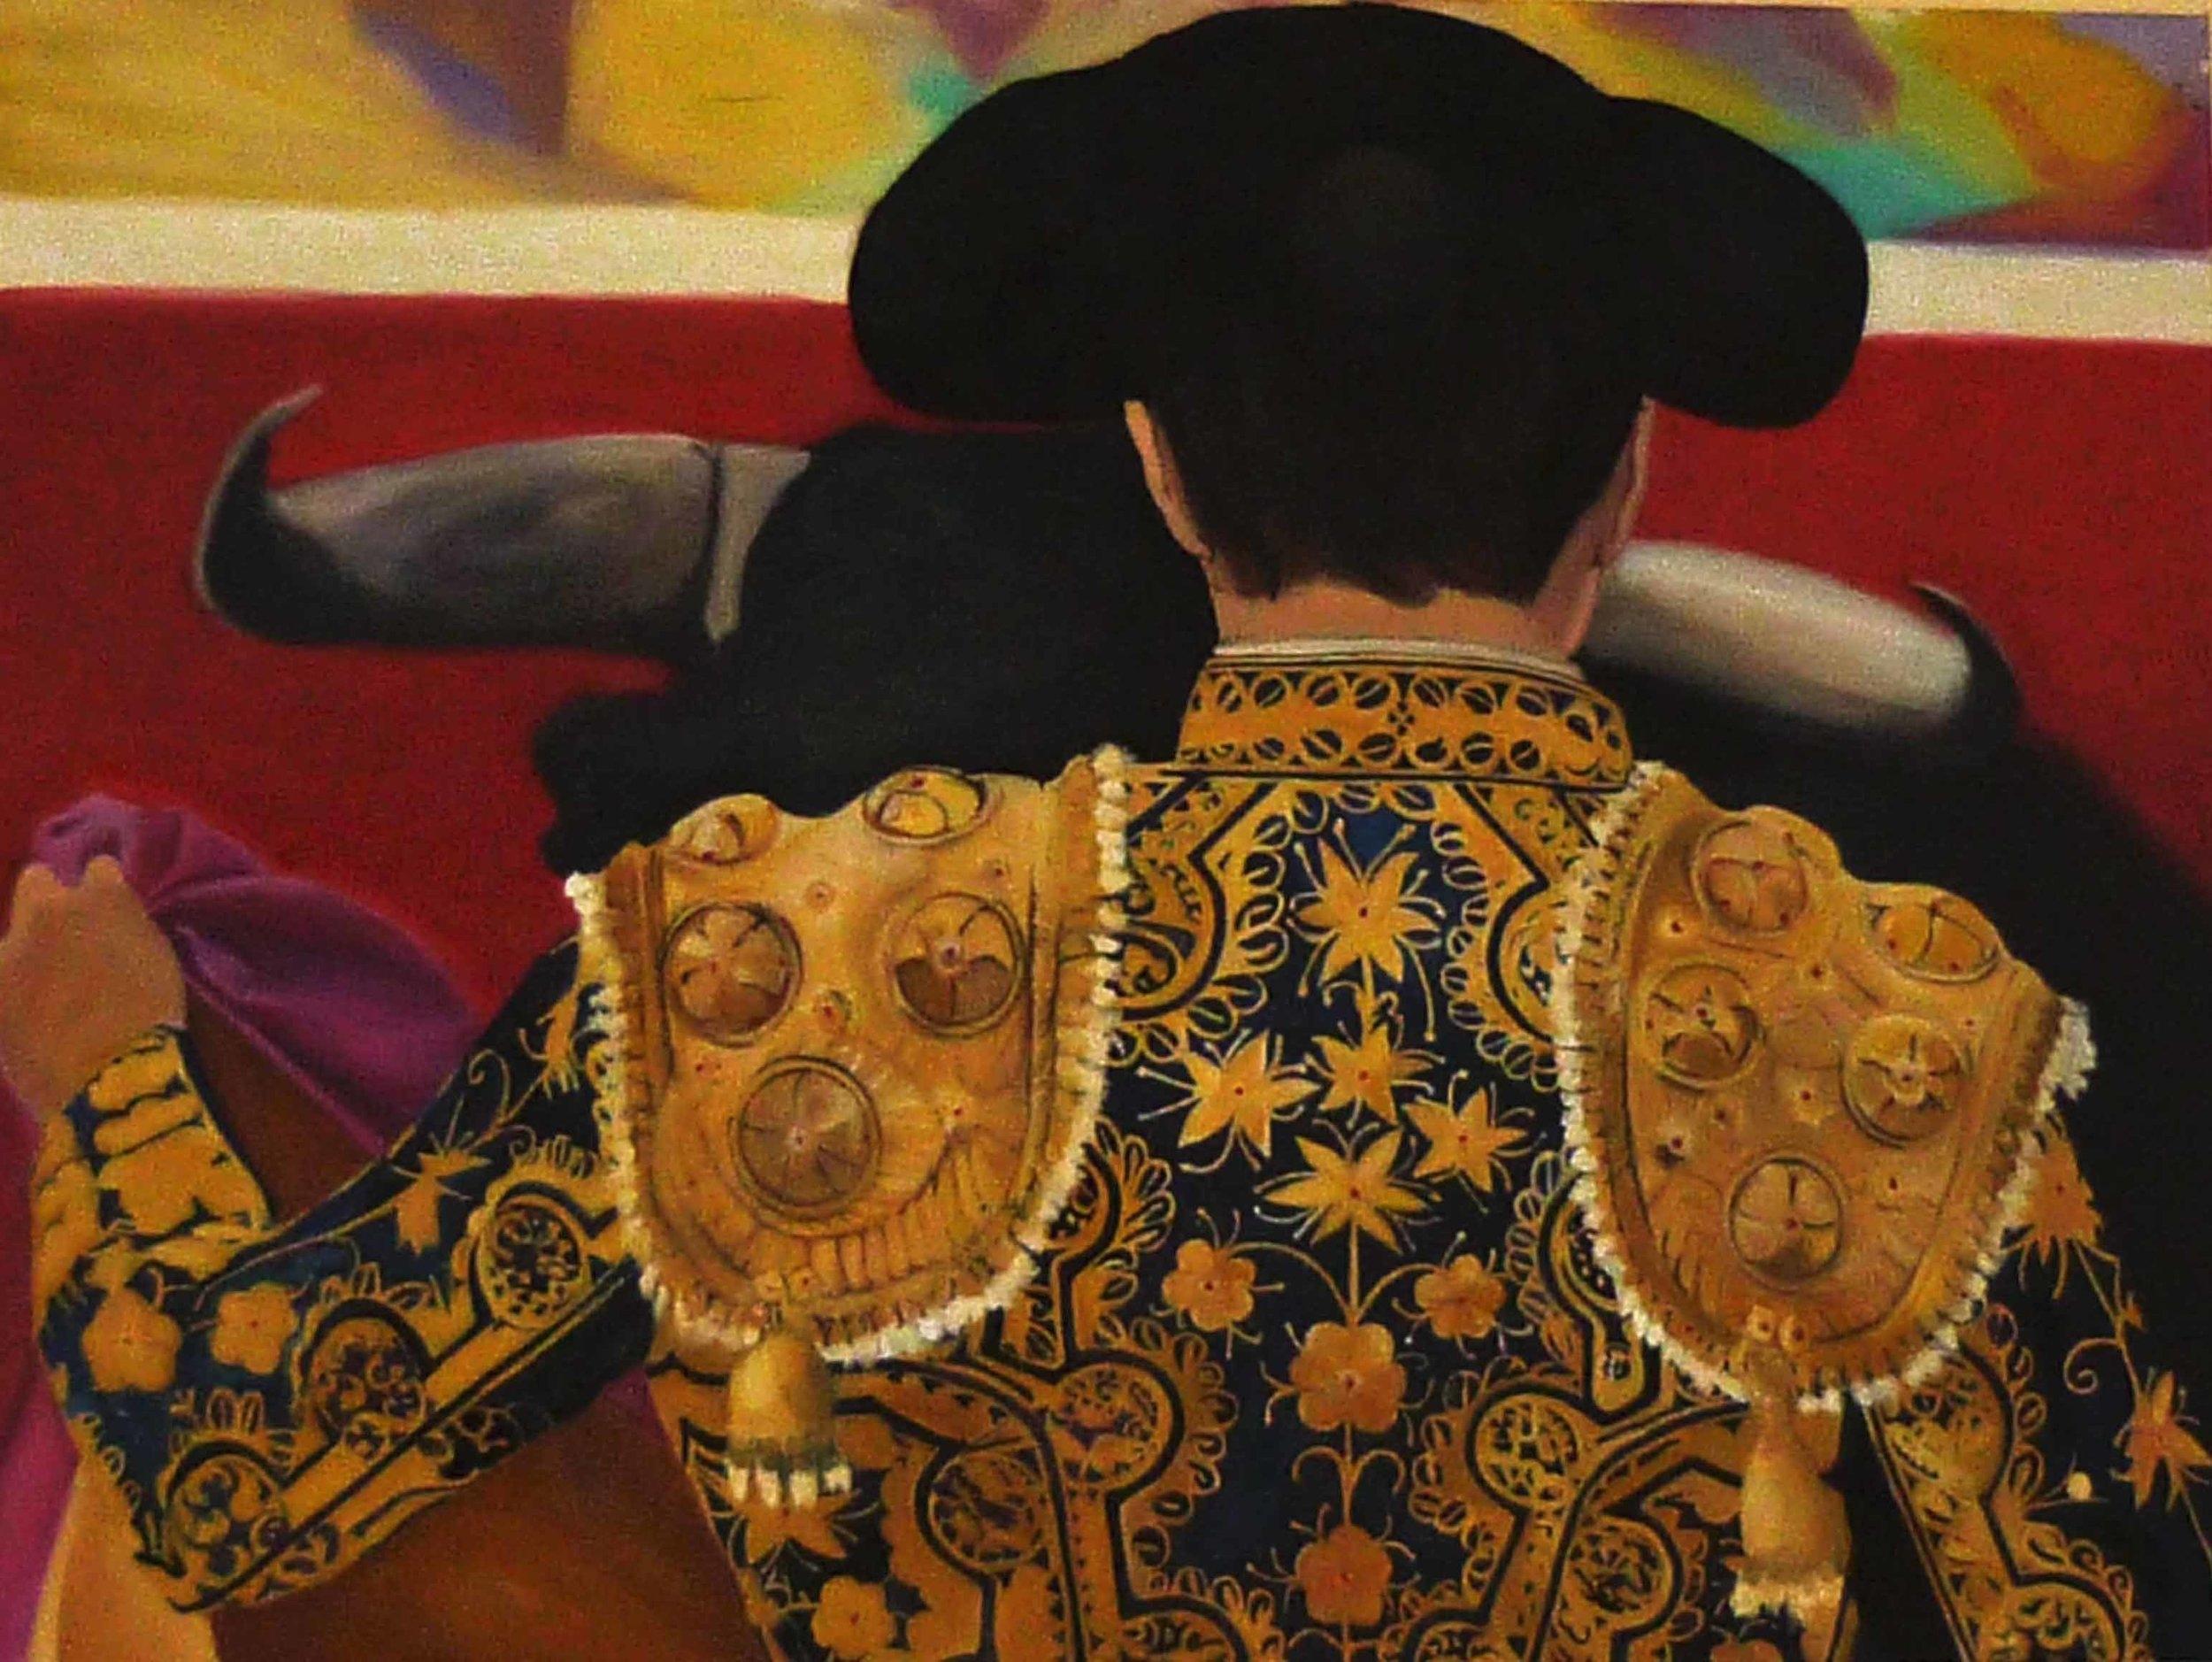 OILS & ACRYLIC - view my oil & acrylic paintings